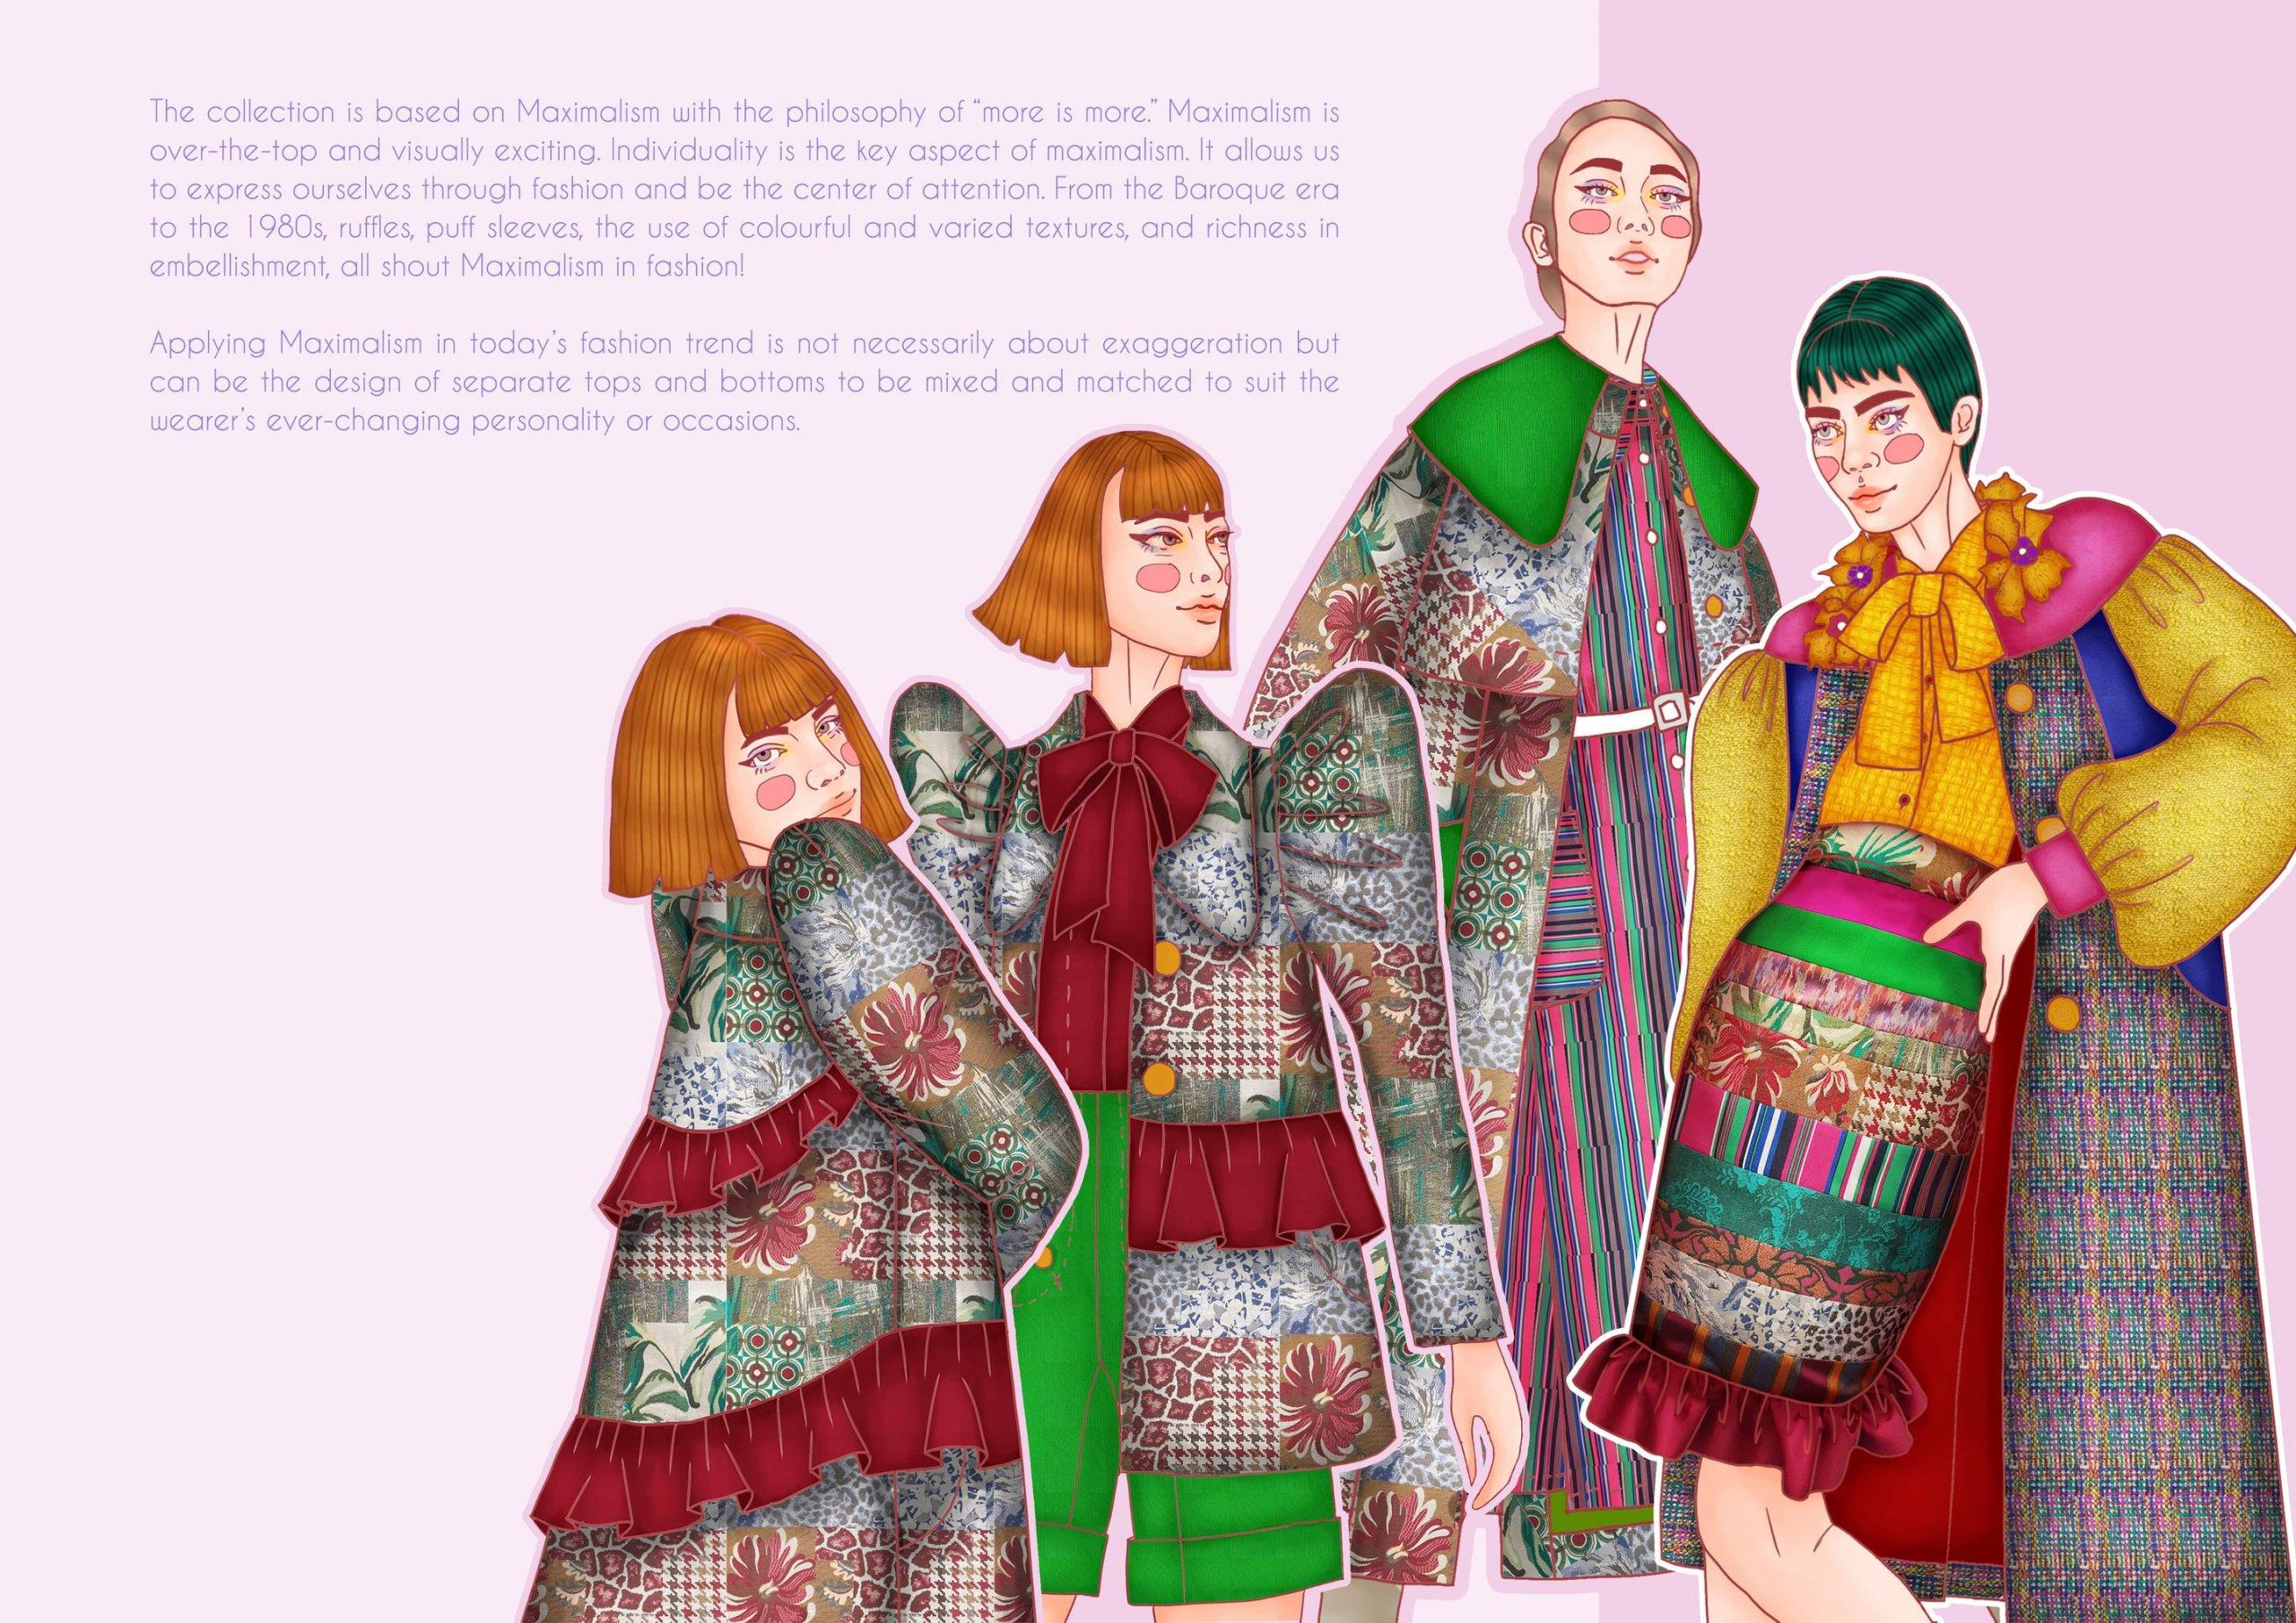 SHOWStudio Class of 2021 Fashion Design International Submission Raffles Fashion Designer Jenny Nguyen Le Huong Giang Moodboard 1